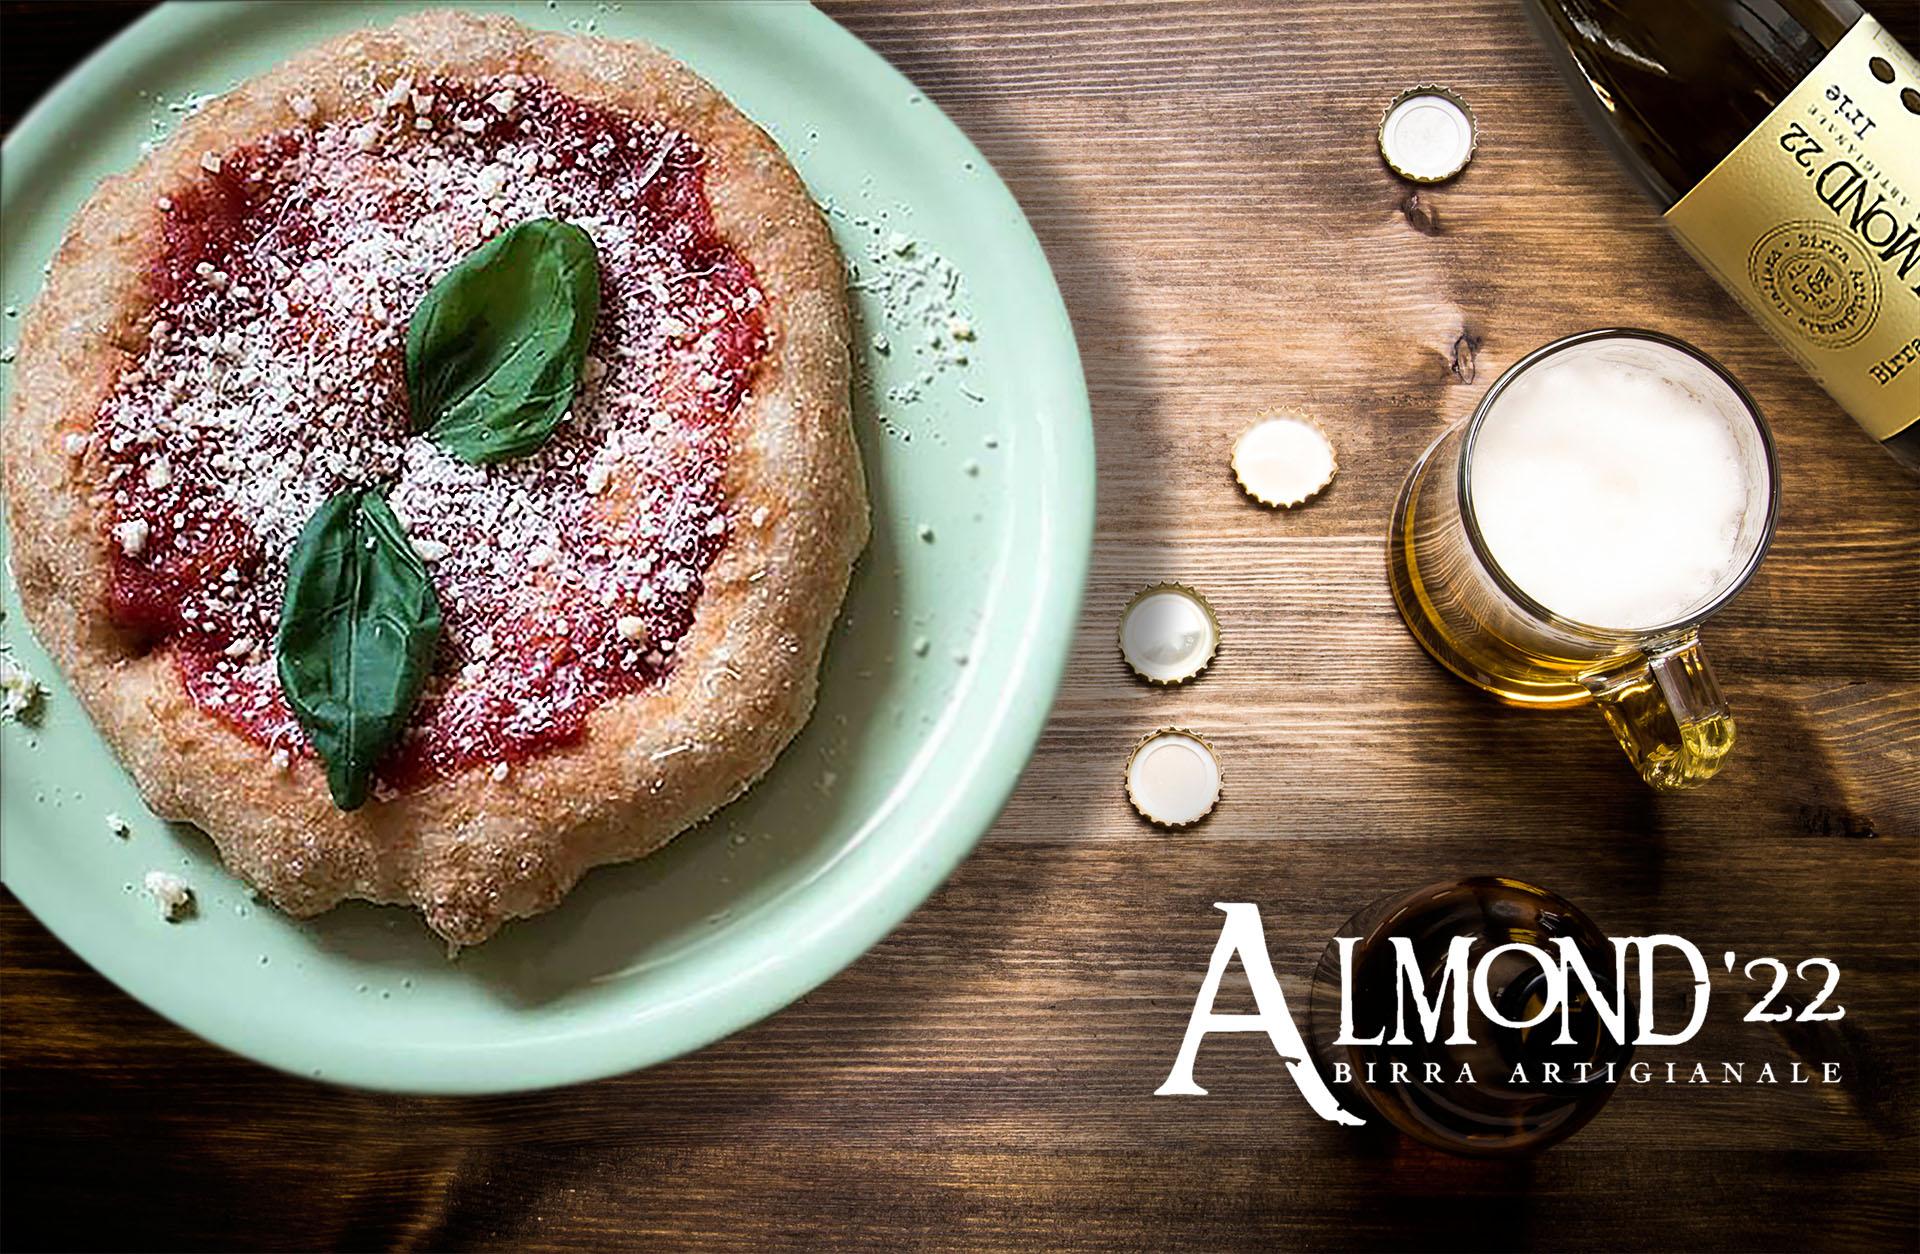 Santarpia-Almond-blog